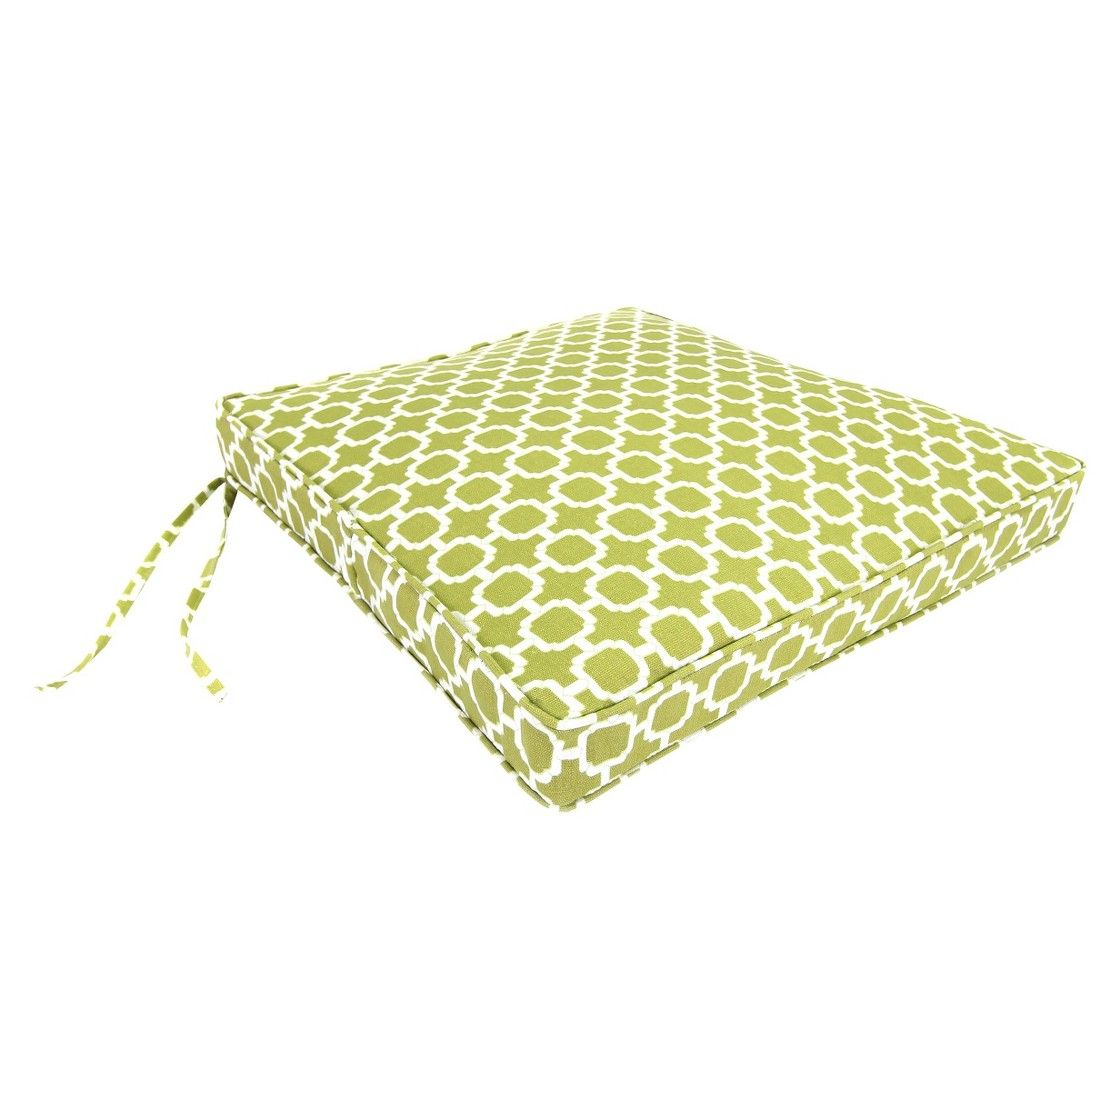 "Outdoor Seat Cushion - Green/White Geometric 19""x17"""